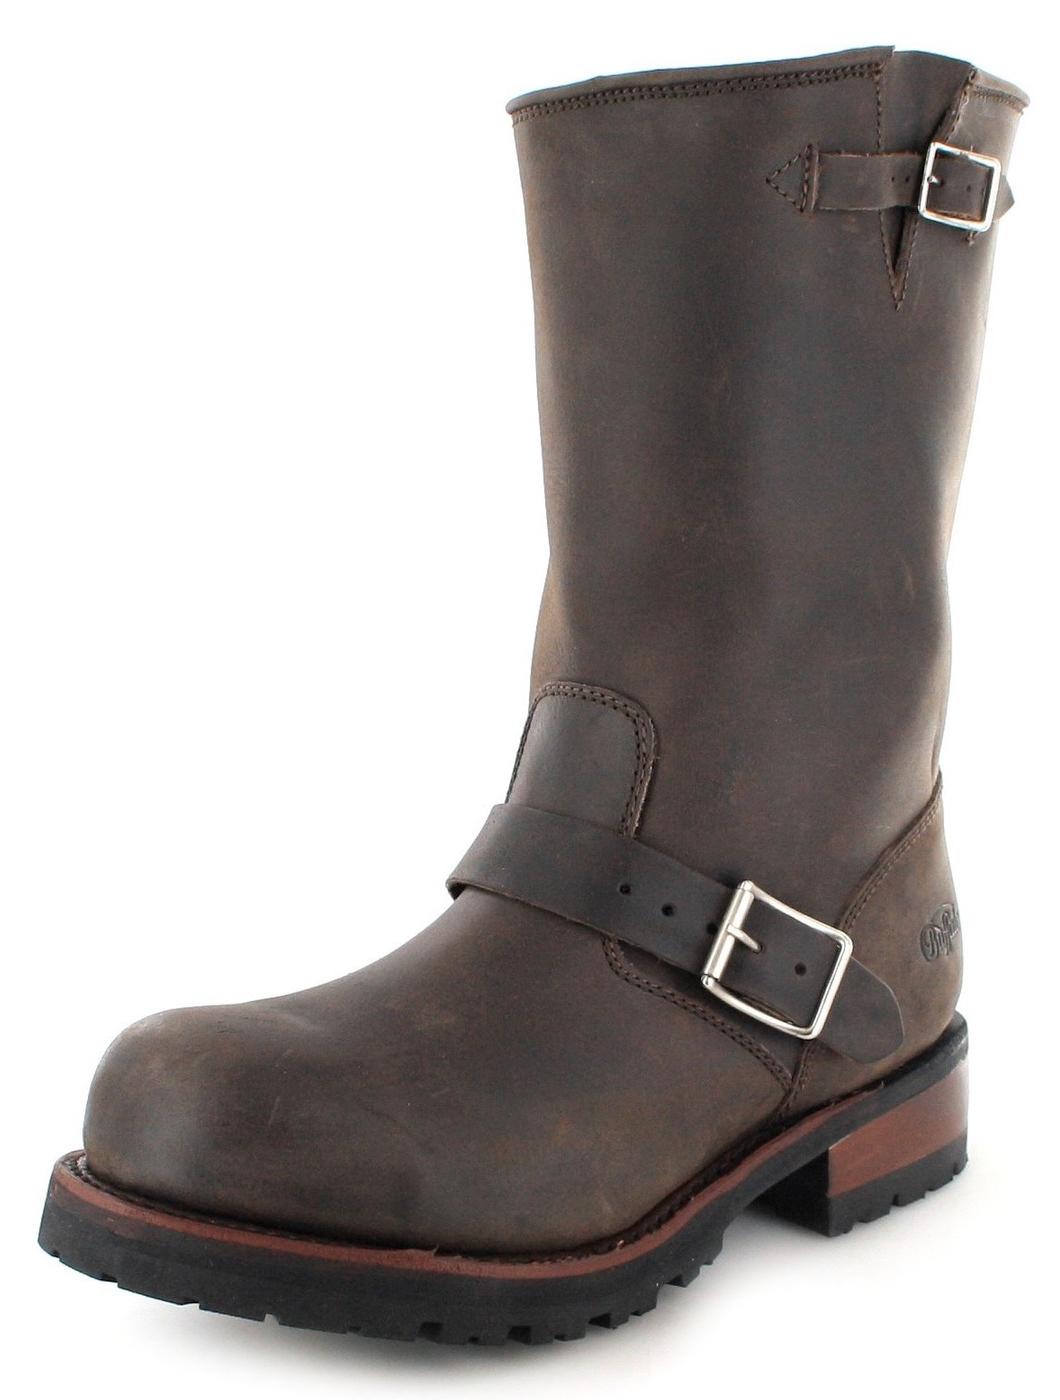 Buffalo Boots 1808 Engineer boot with steel toecap  - brown